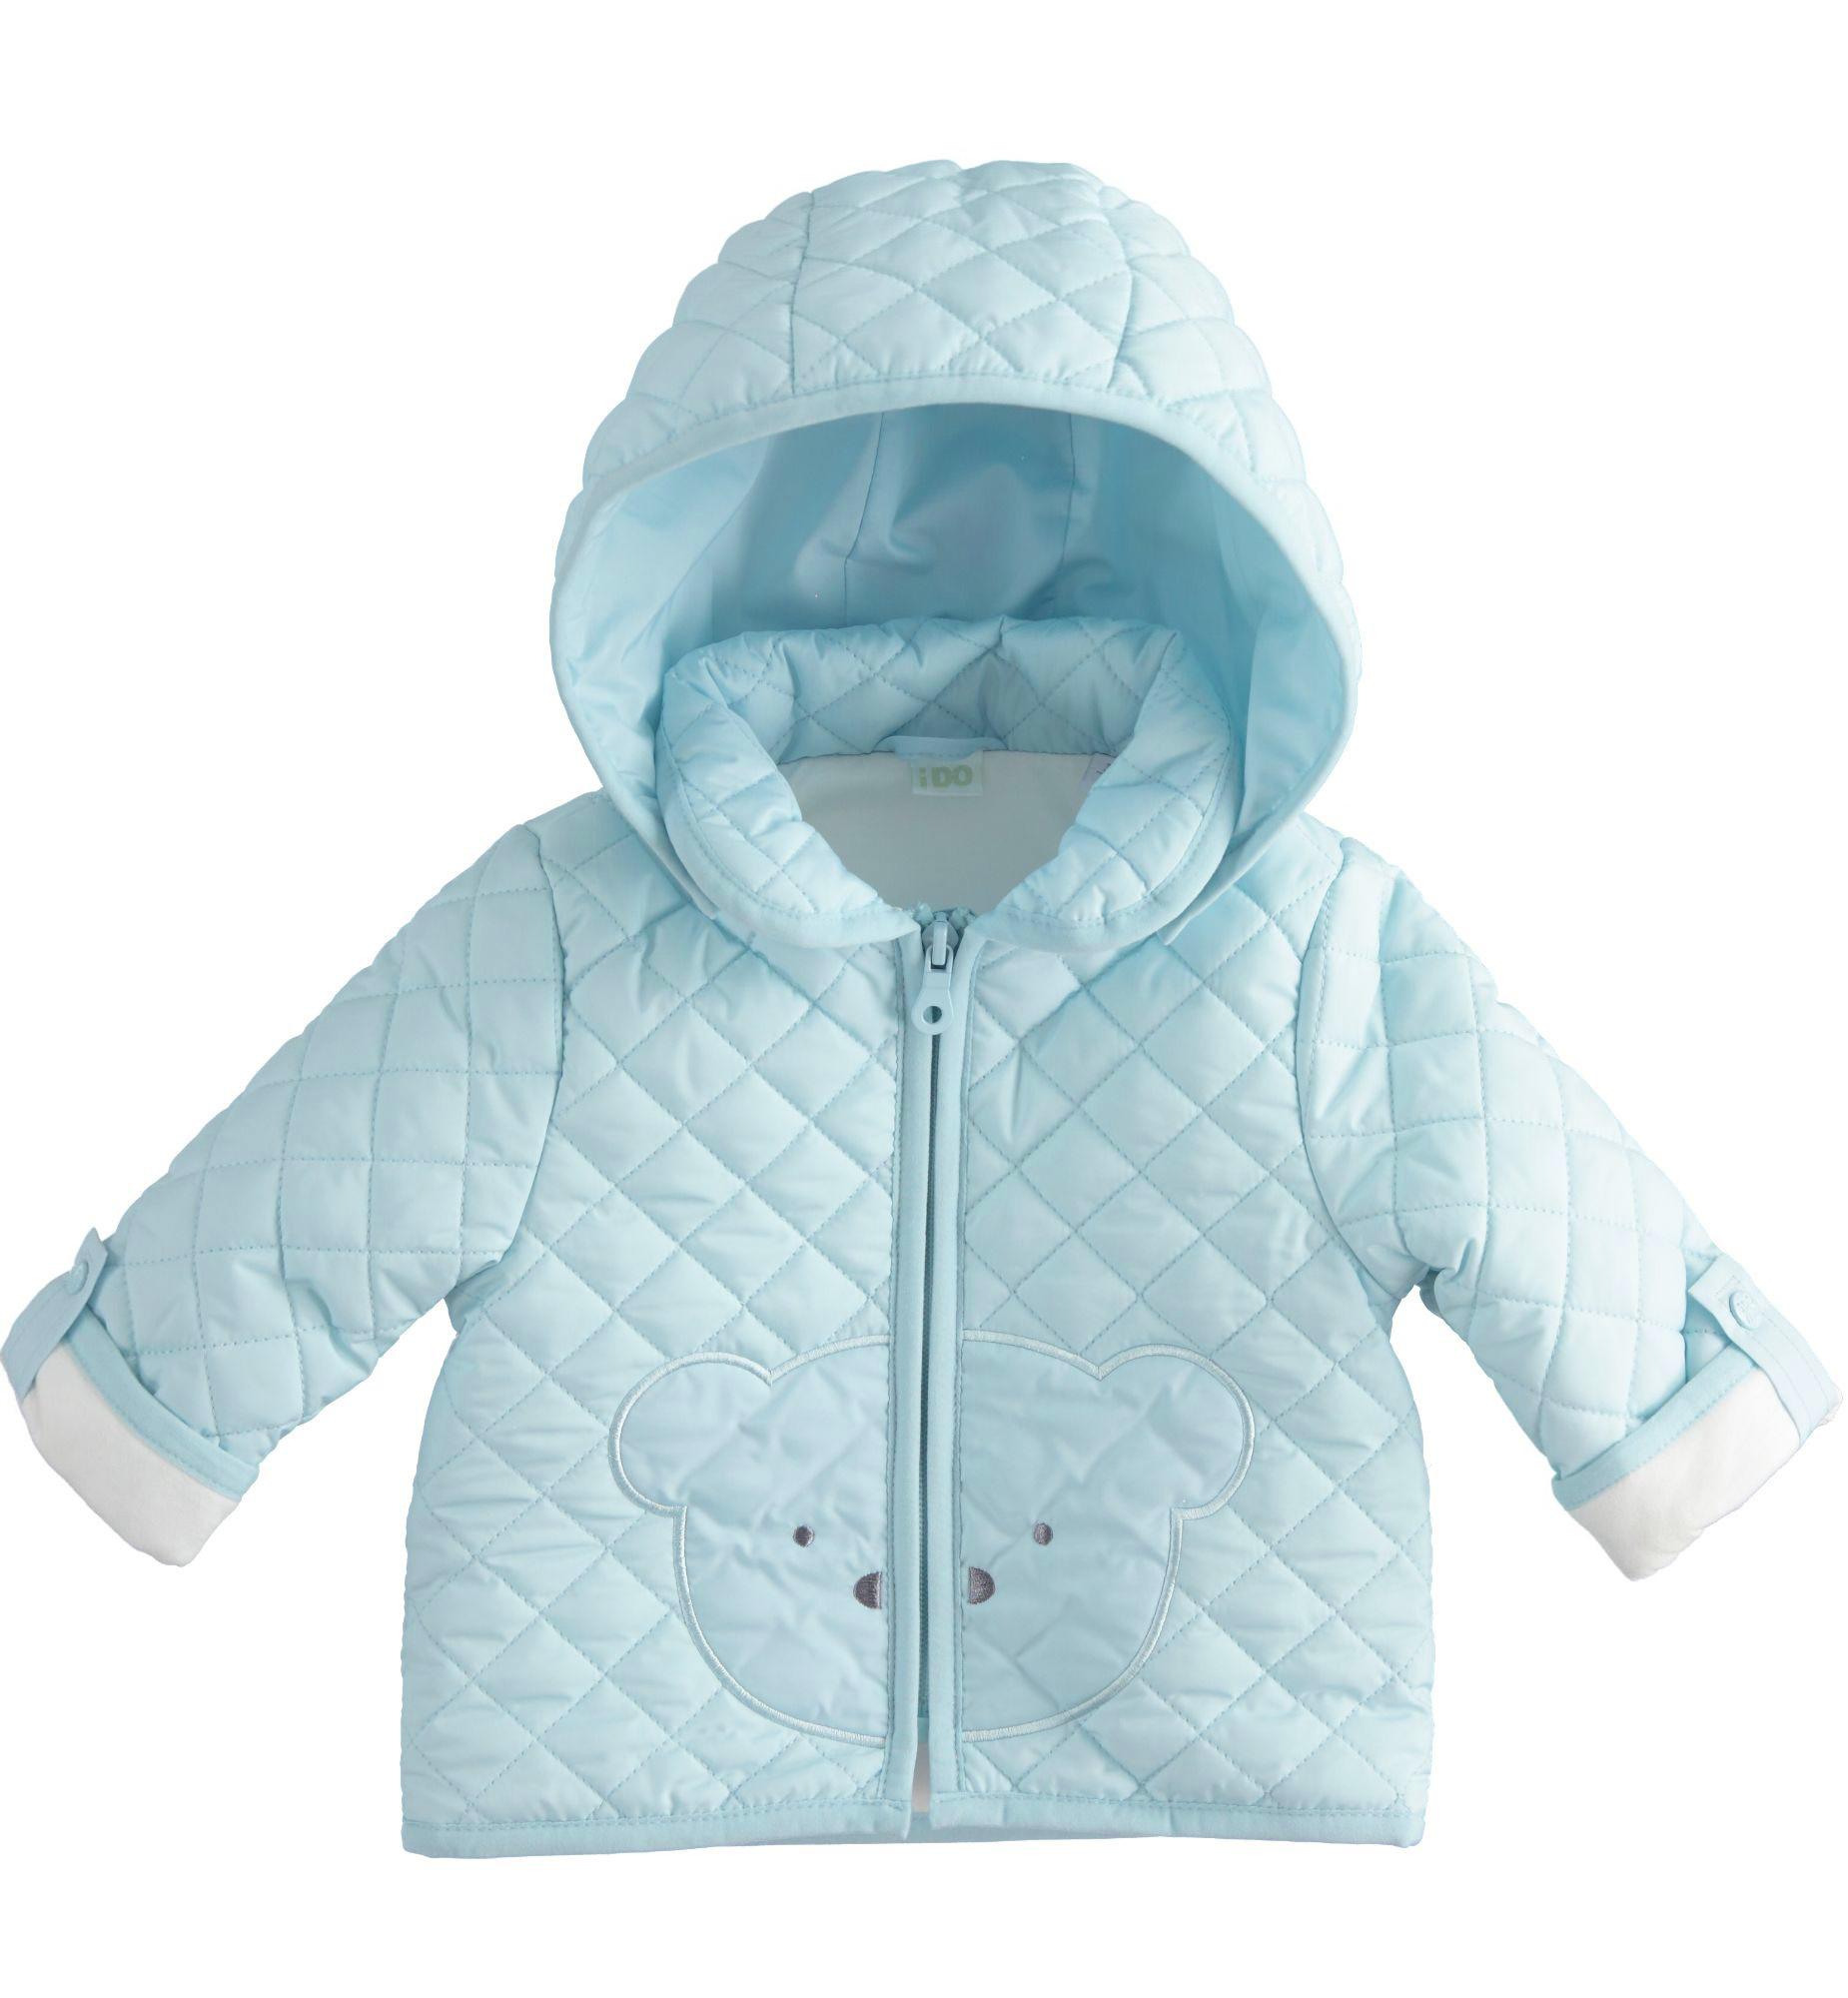 Ido iDO Blue Padded Bear Jacket - 43299